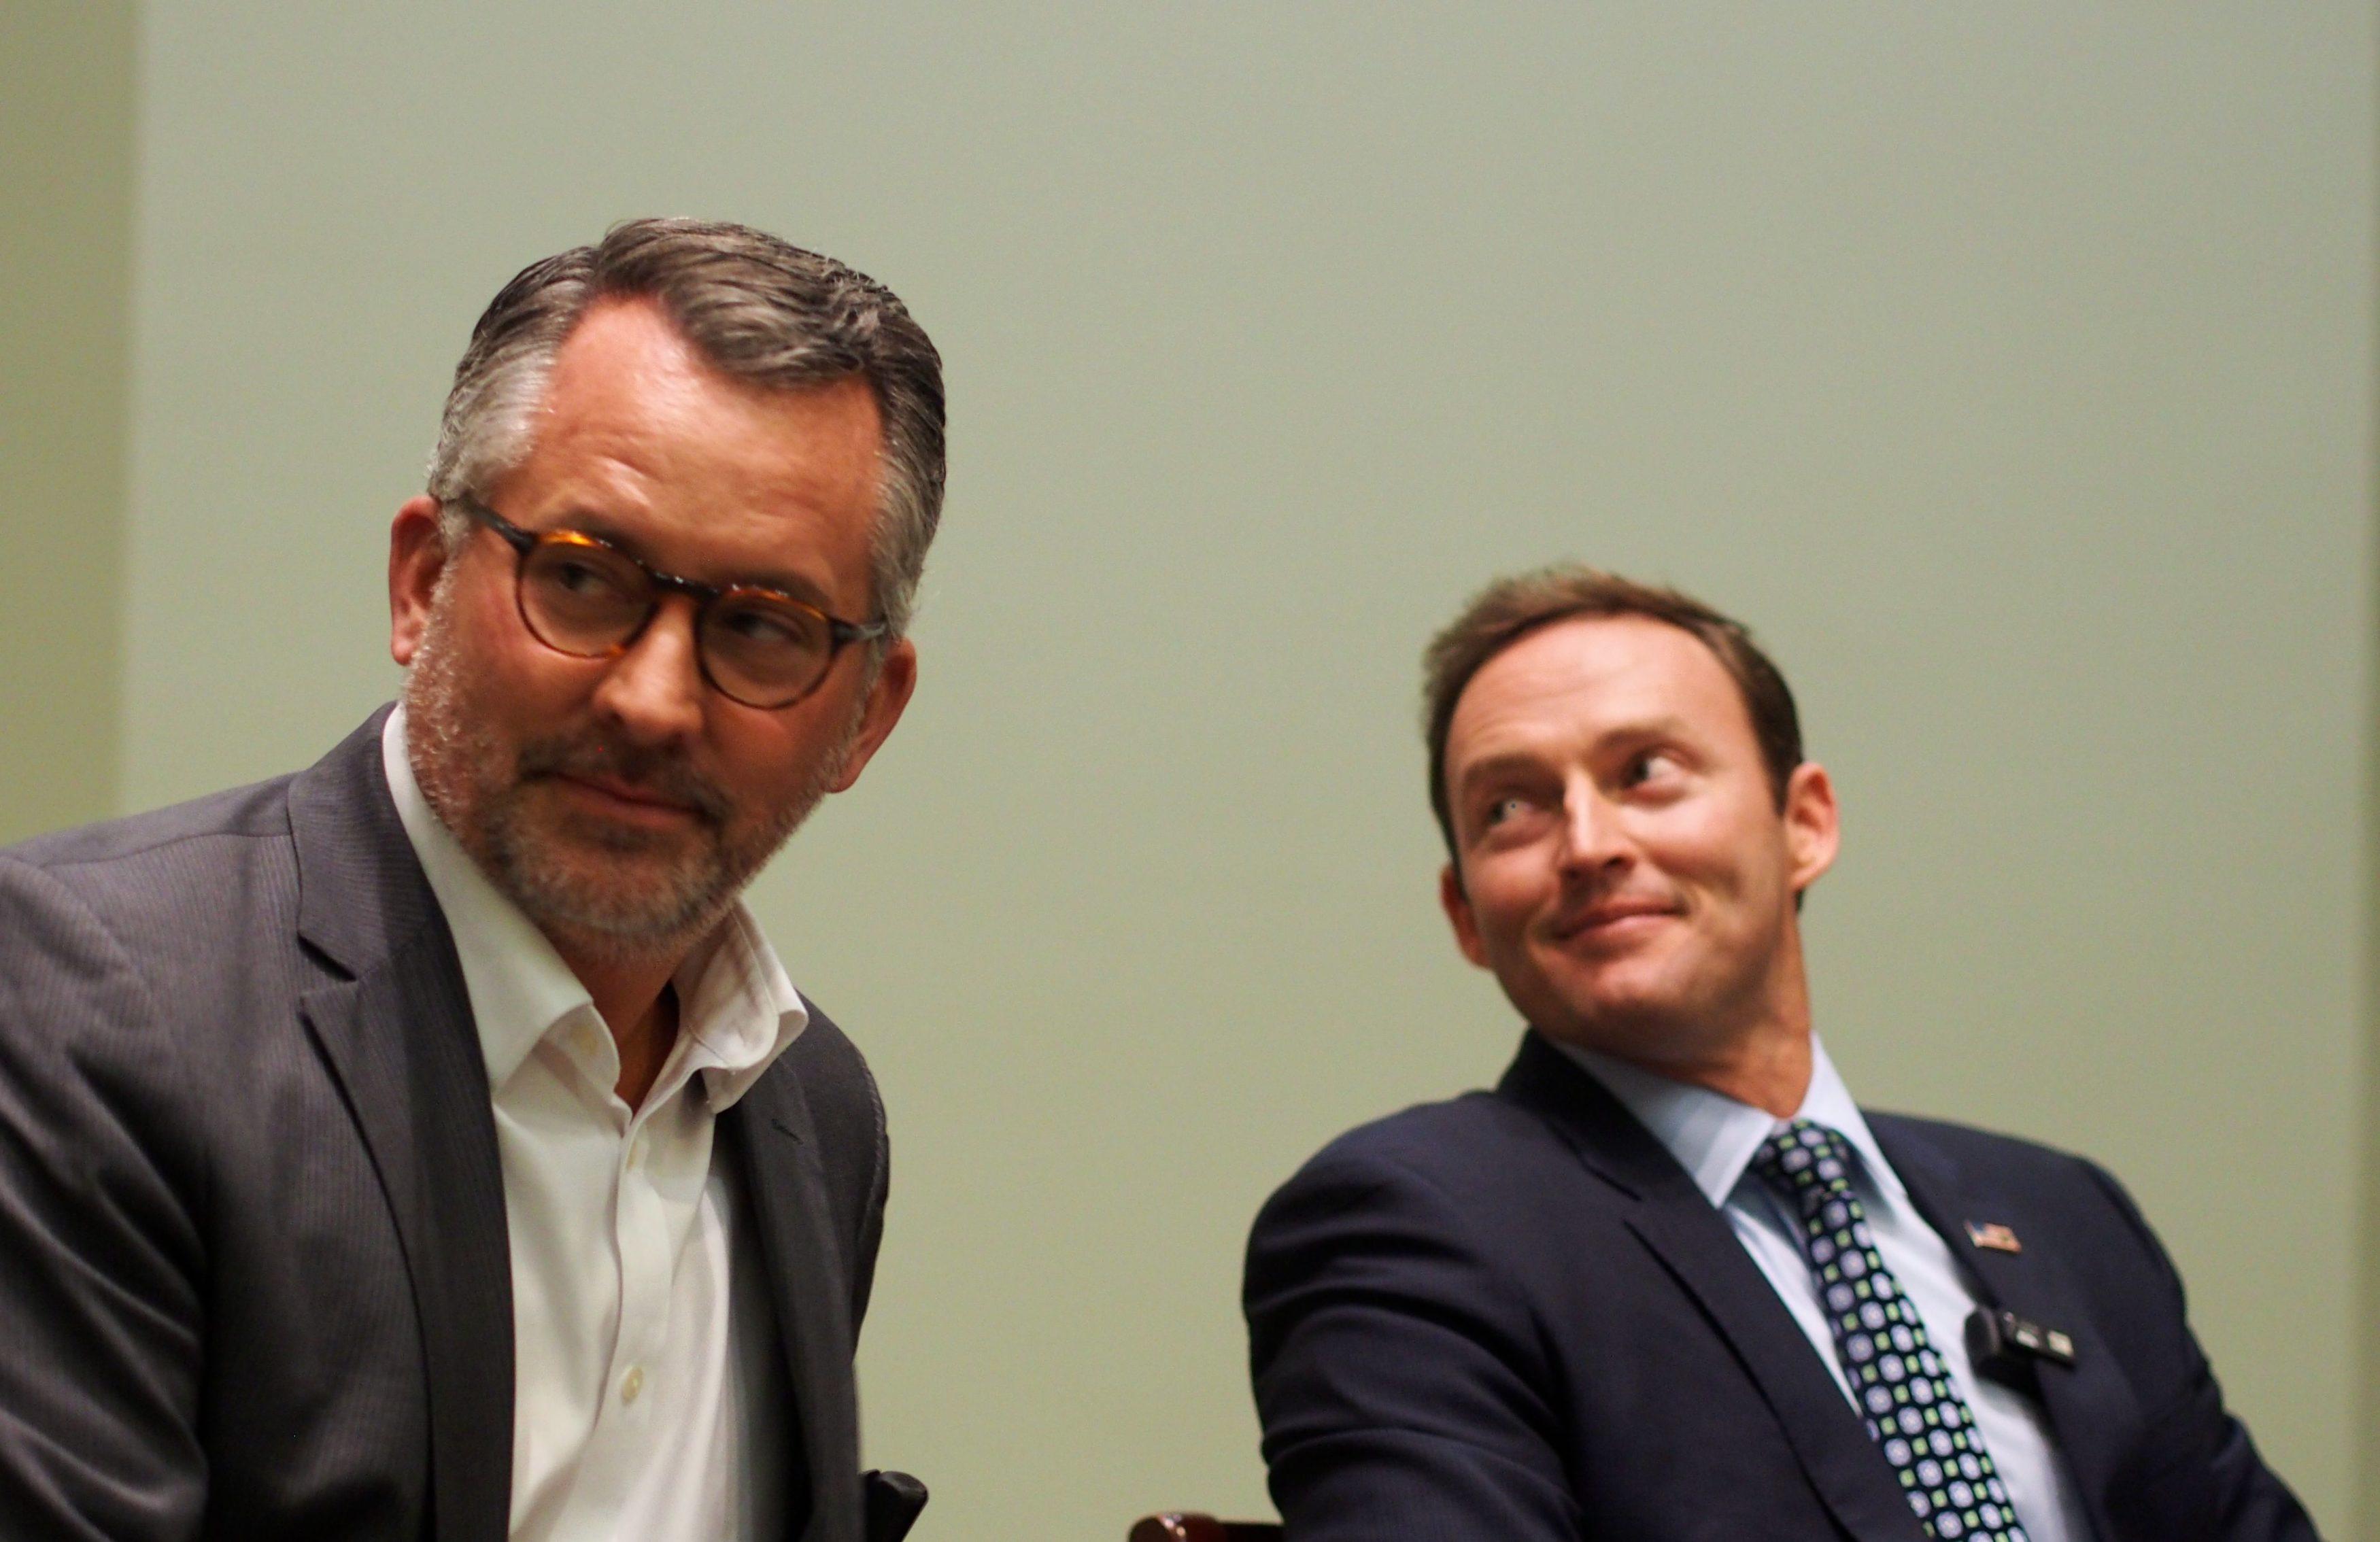 David Jolly and Patrick Murphy